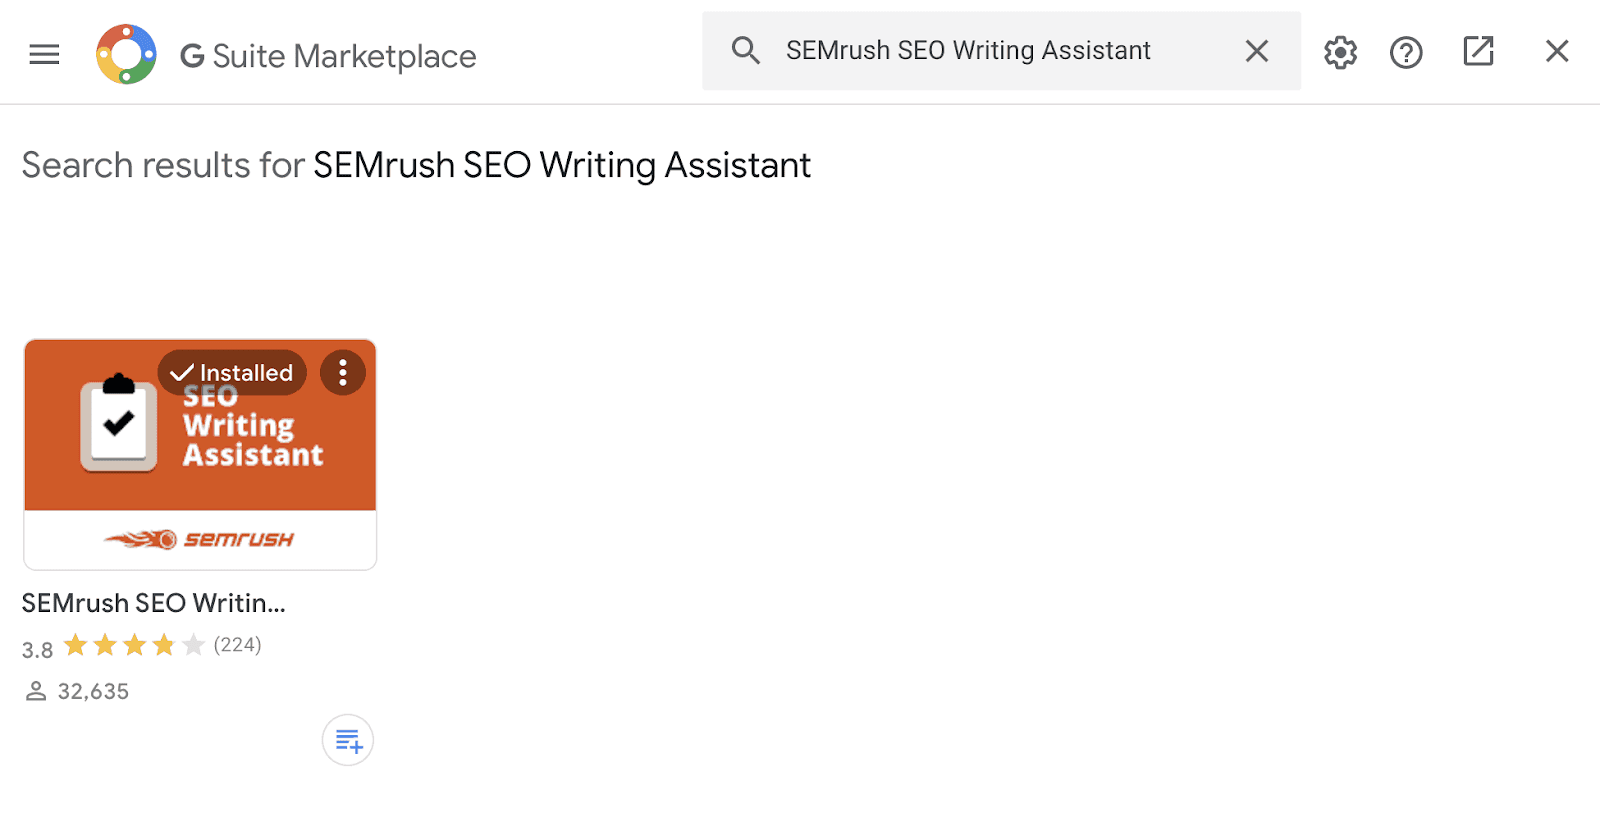 SEMrush SEO Writing Assistant Google Docs Add-on